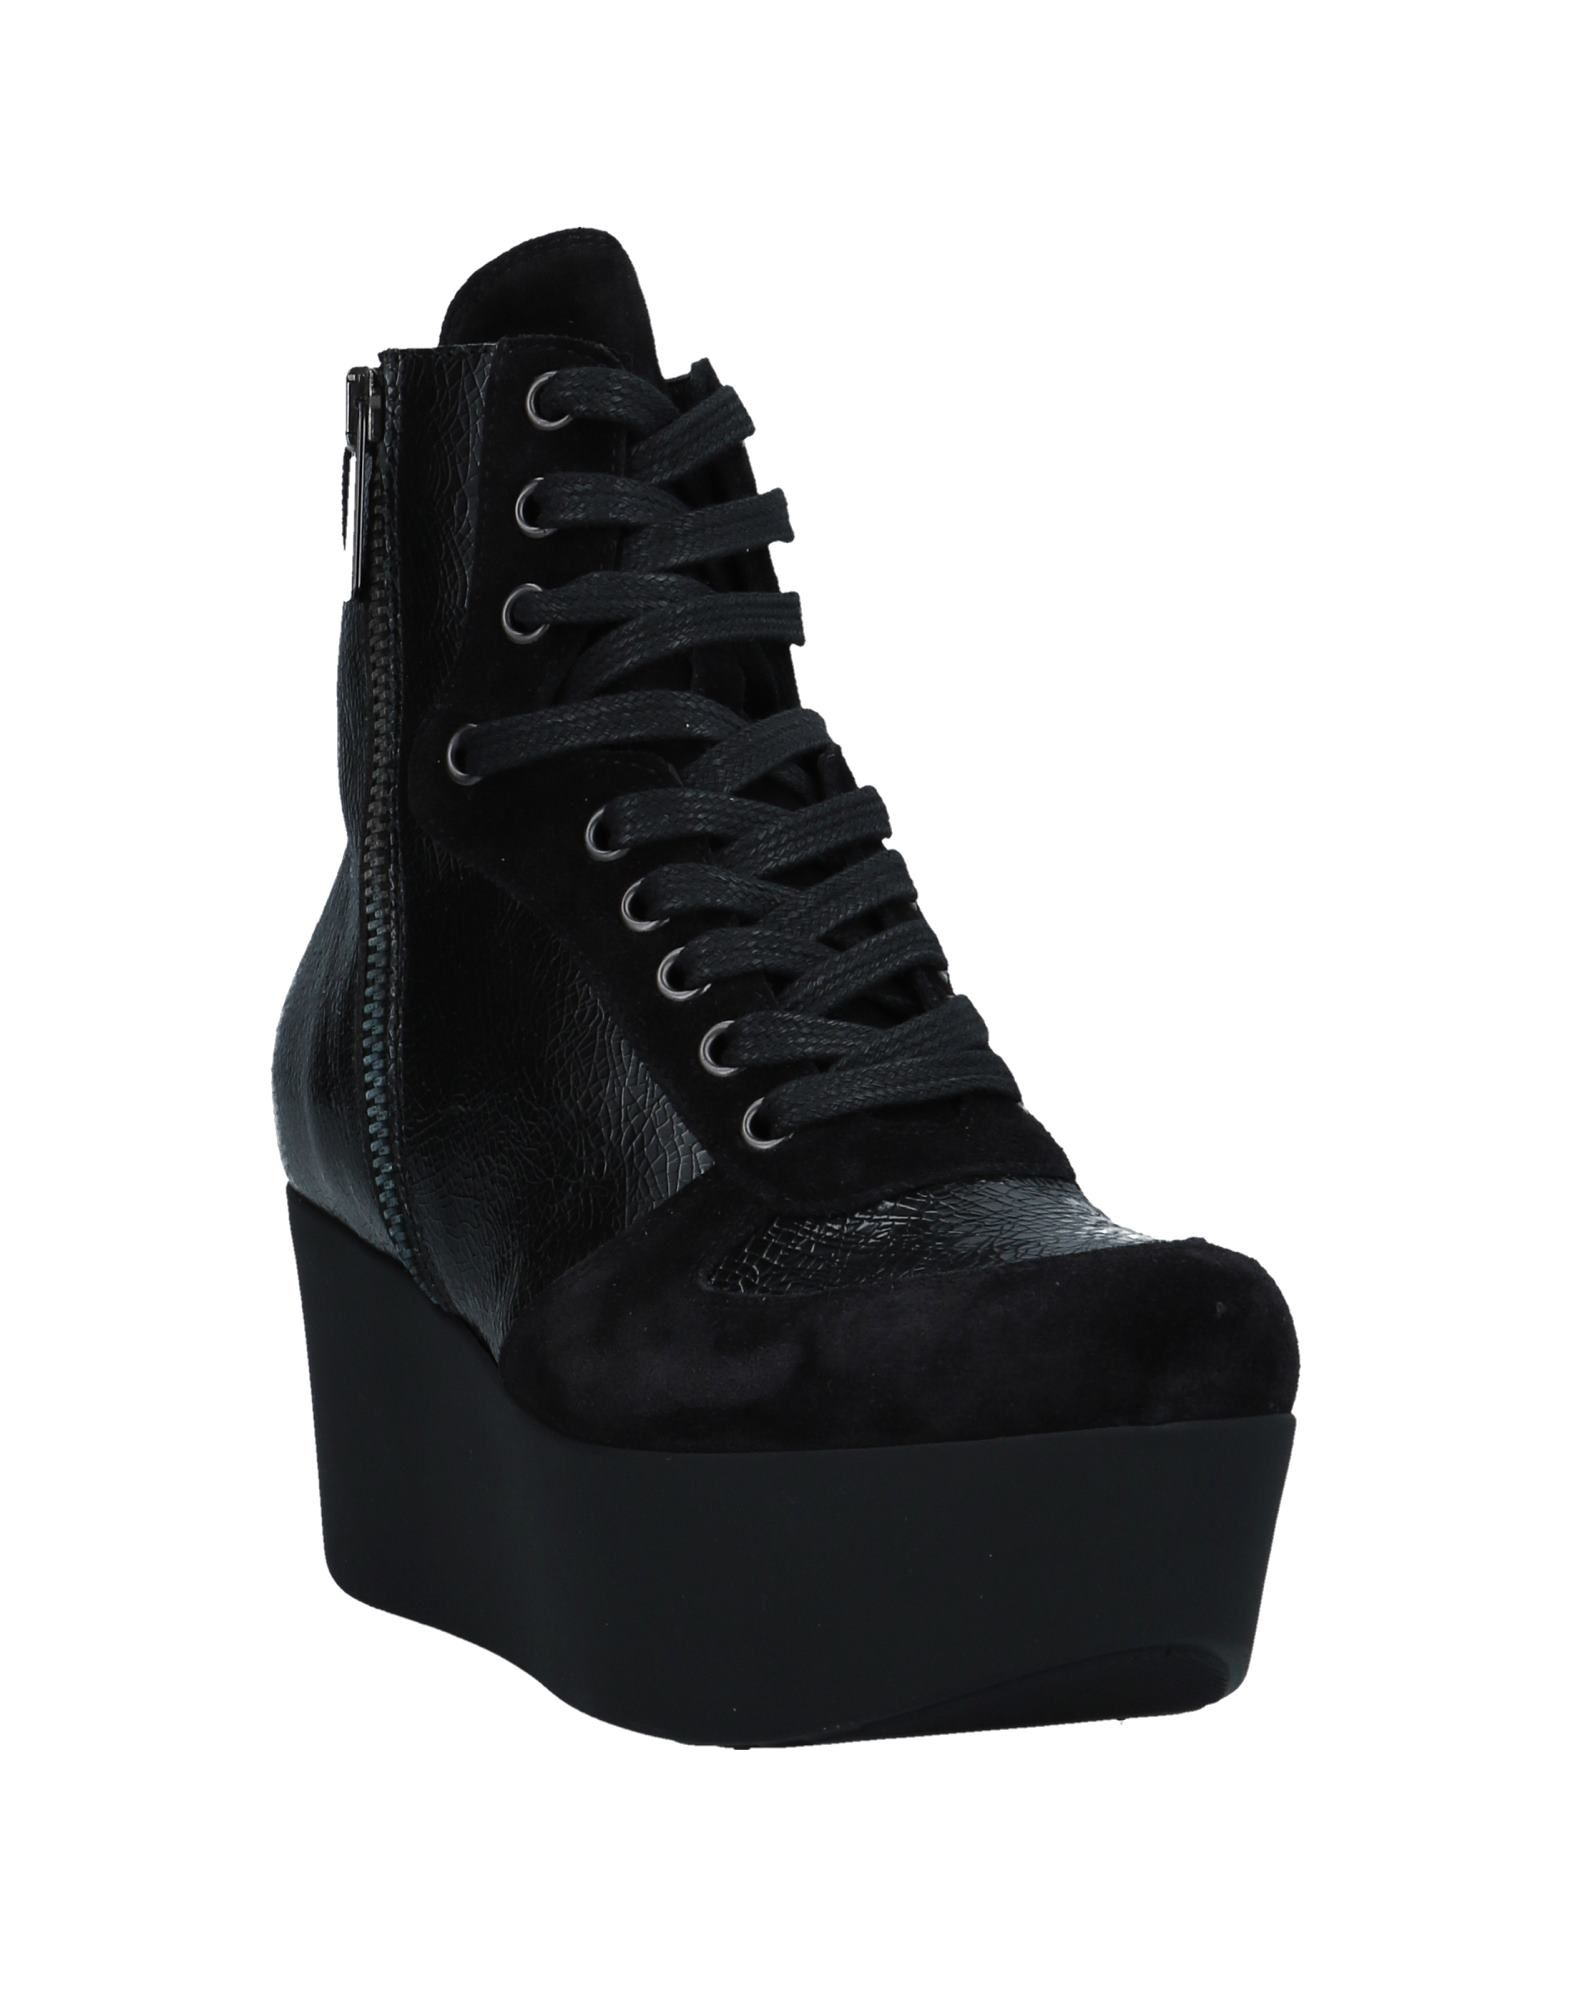 Stilvolle billige Stiefelette Schuhe Jeannot Stiefelette billige Damen  11548216ML b37dac